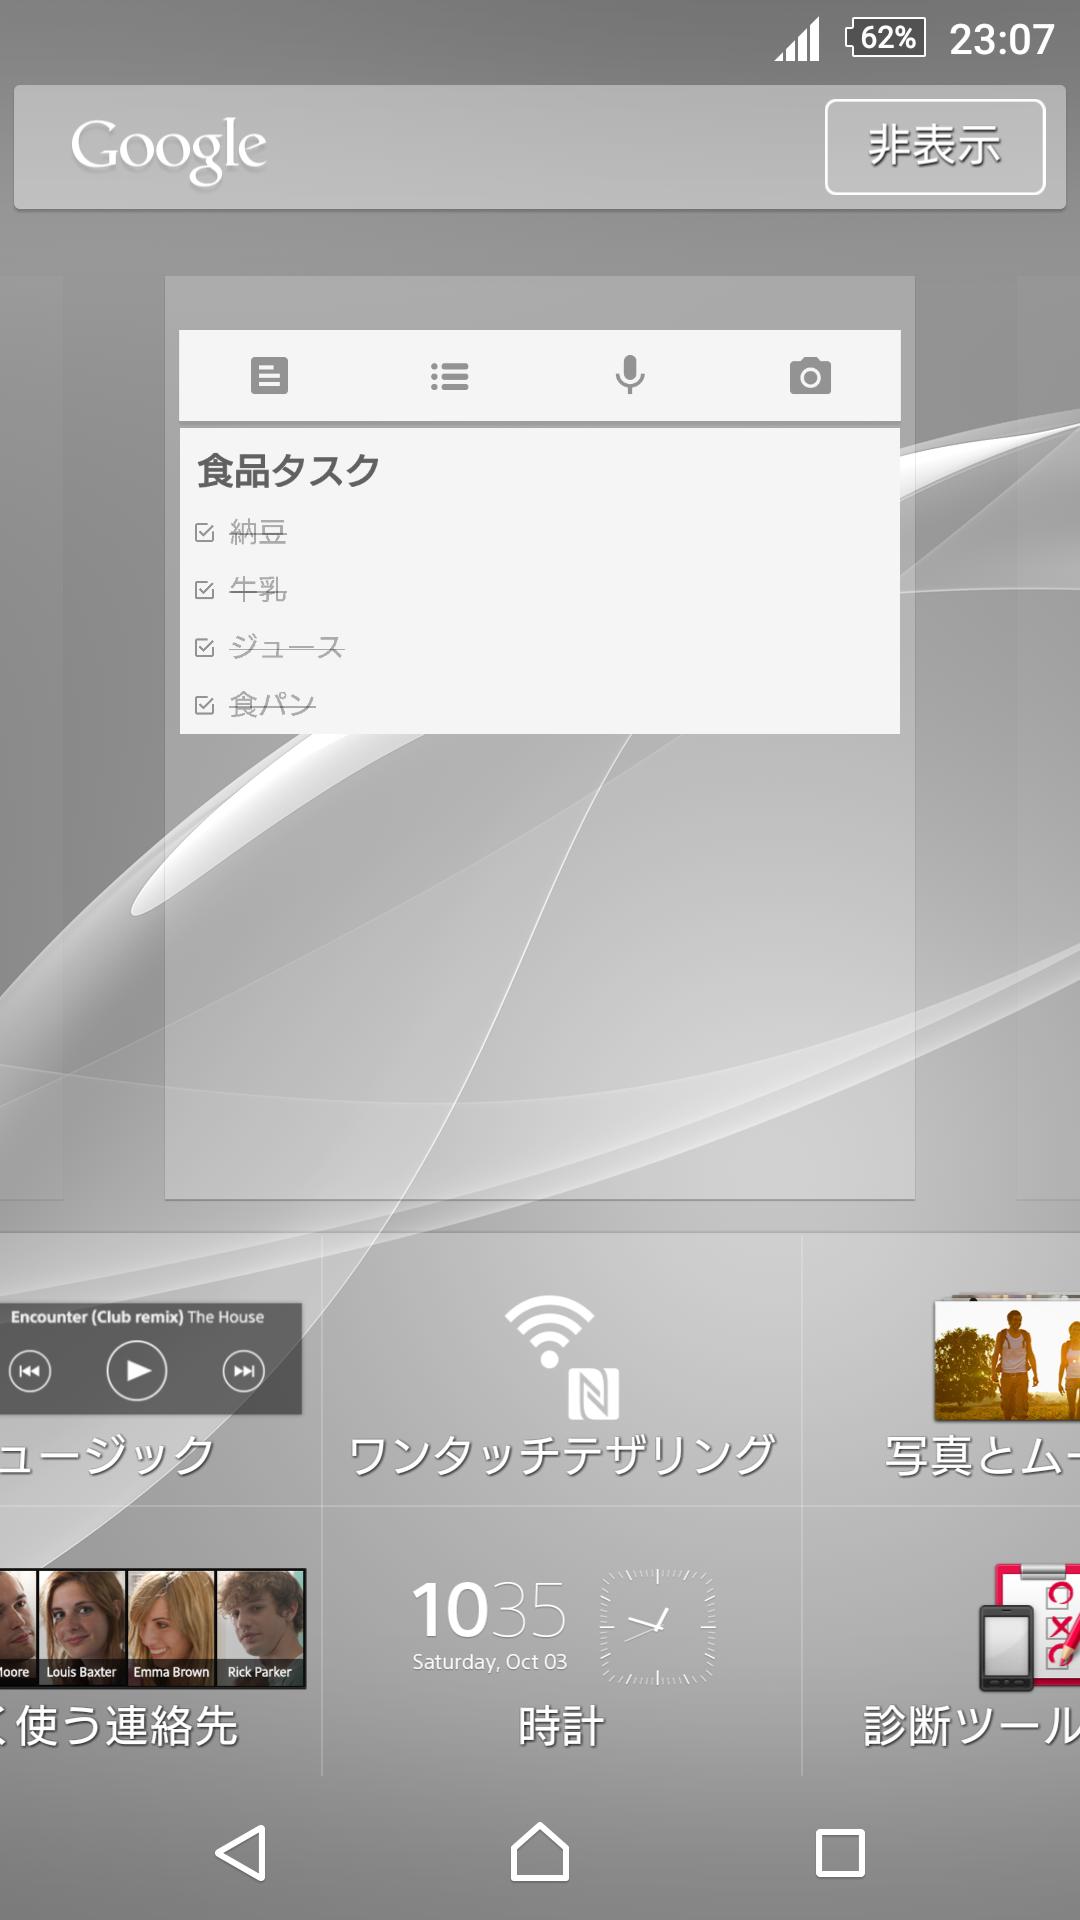 f:id:aokashi:20160505130920p:plain:h300,right